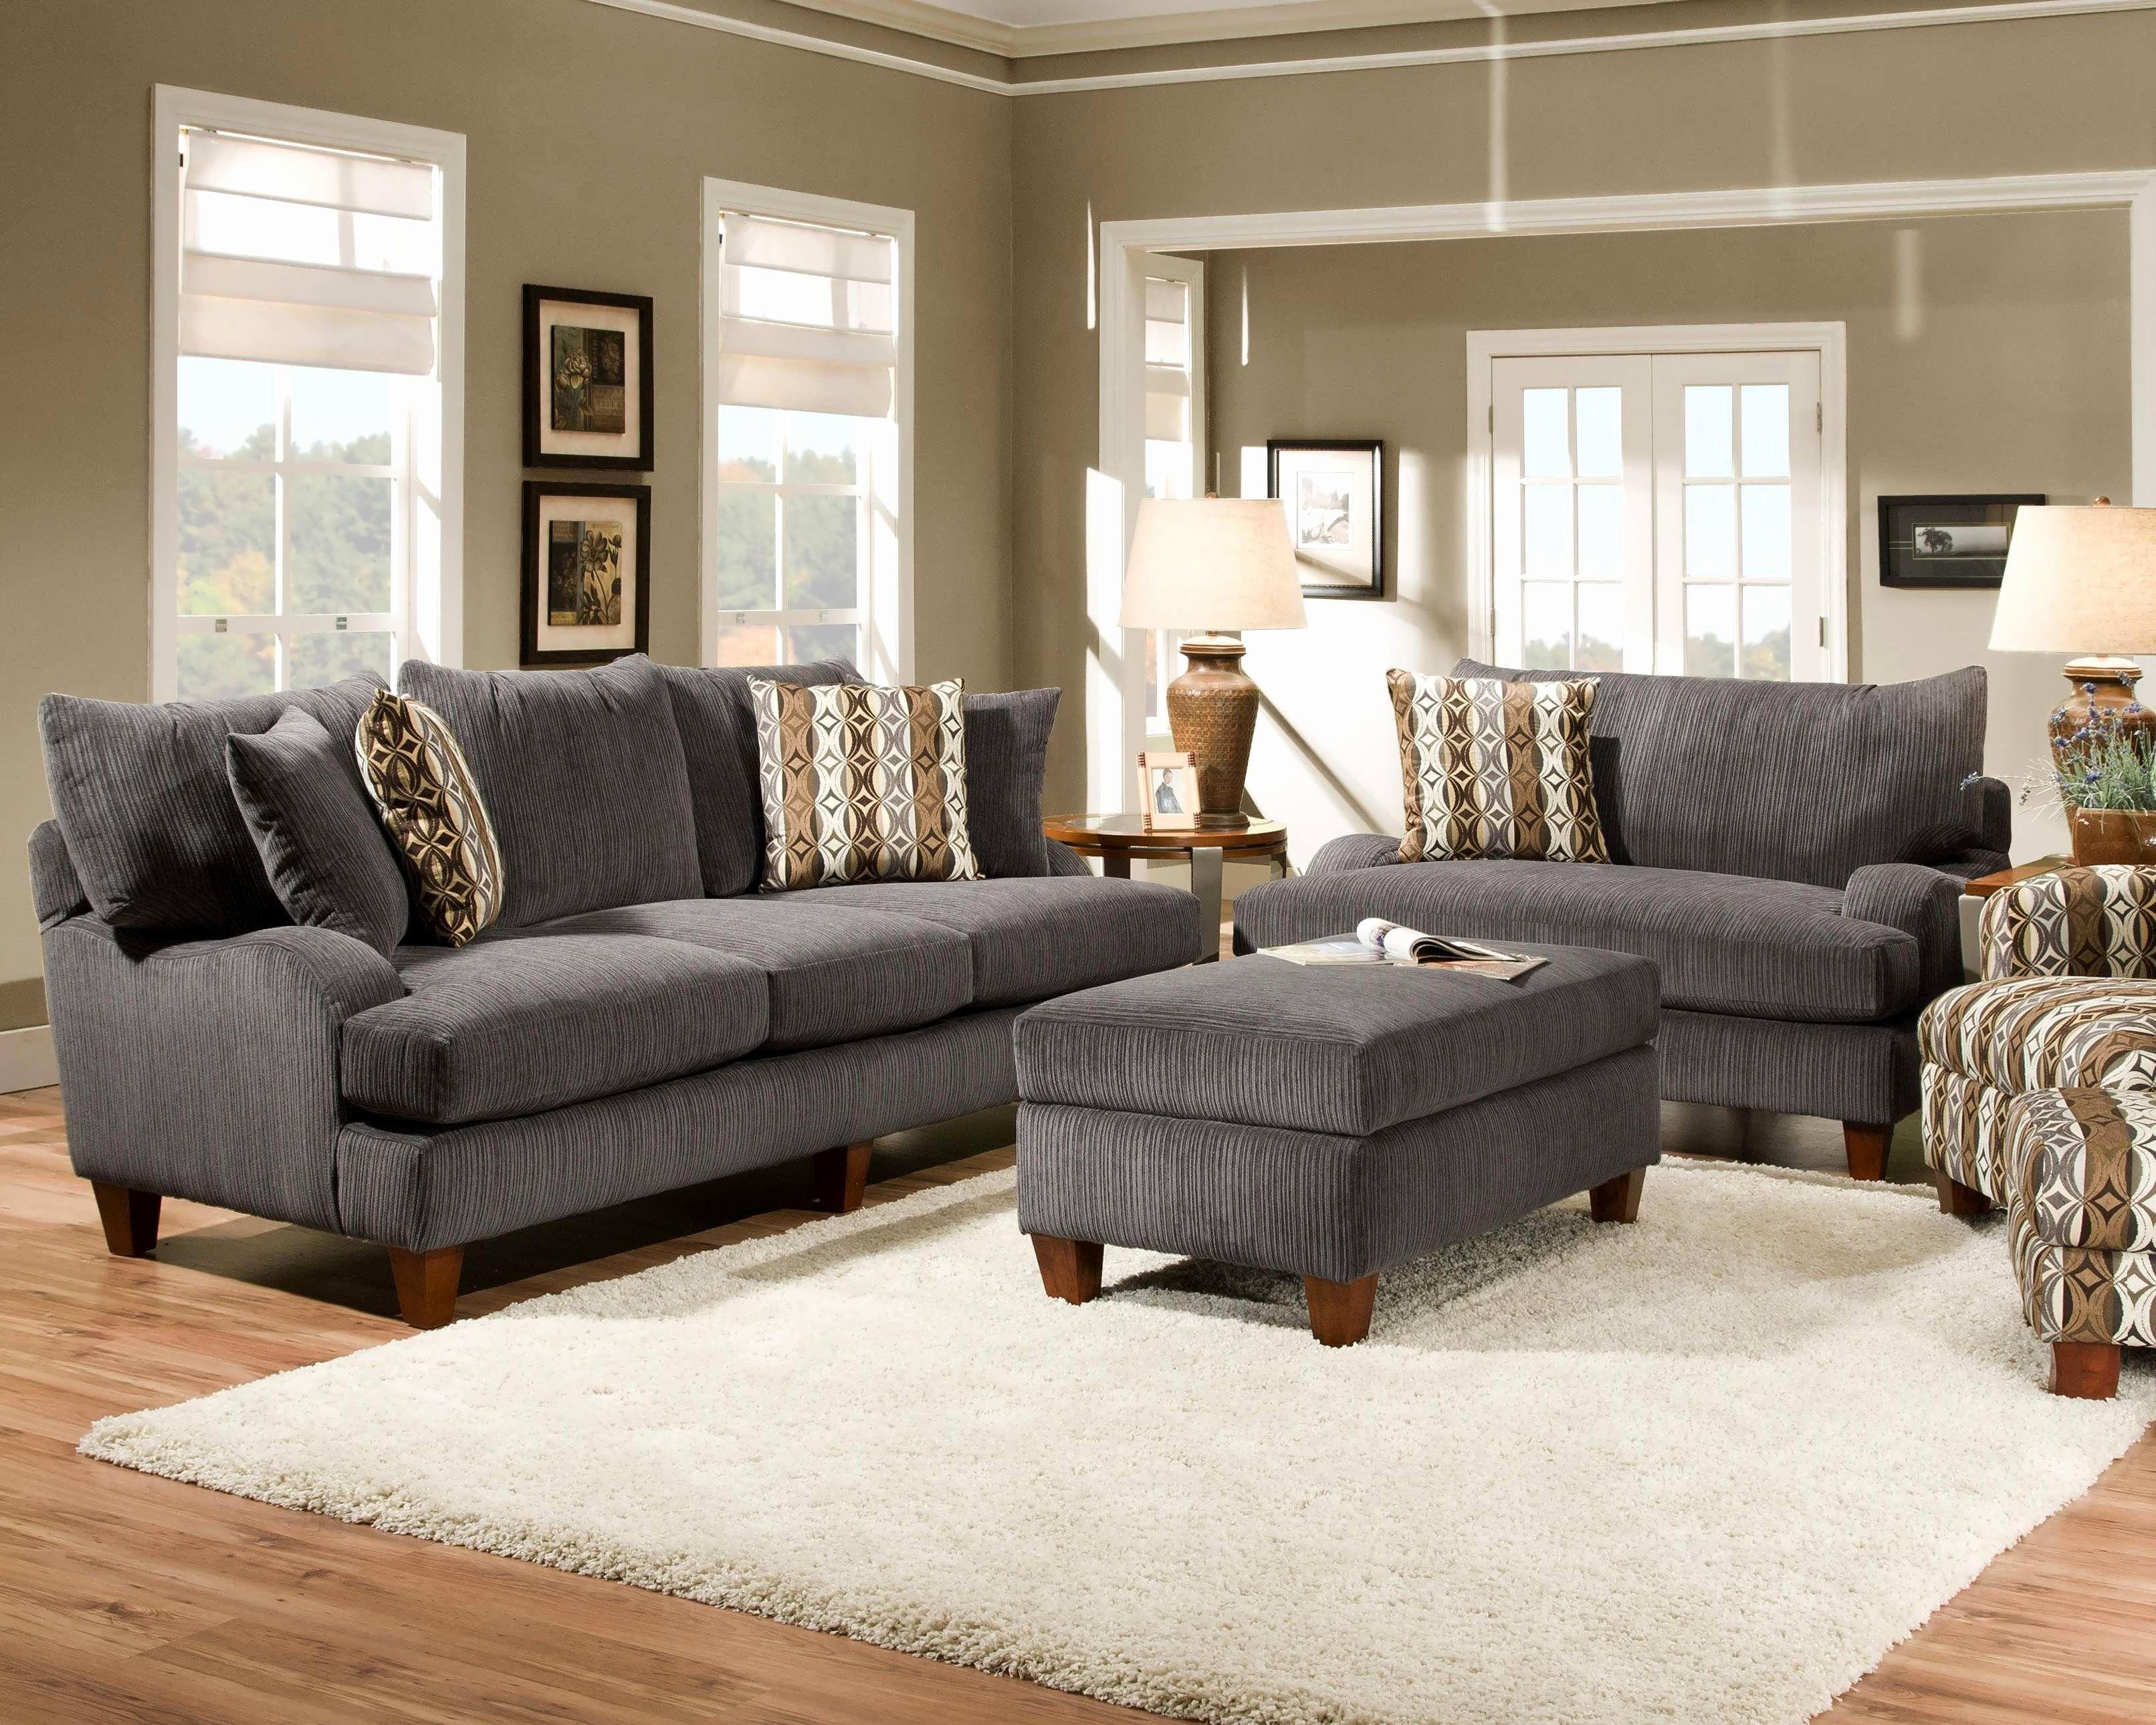 Good Sofas Set Photograpy Sofas Amazing Gray Reclining Sofa Dark